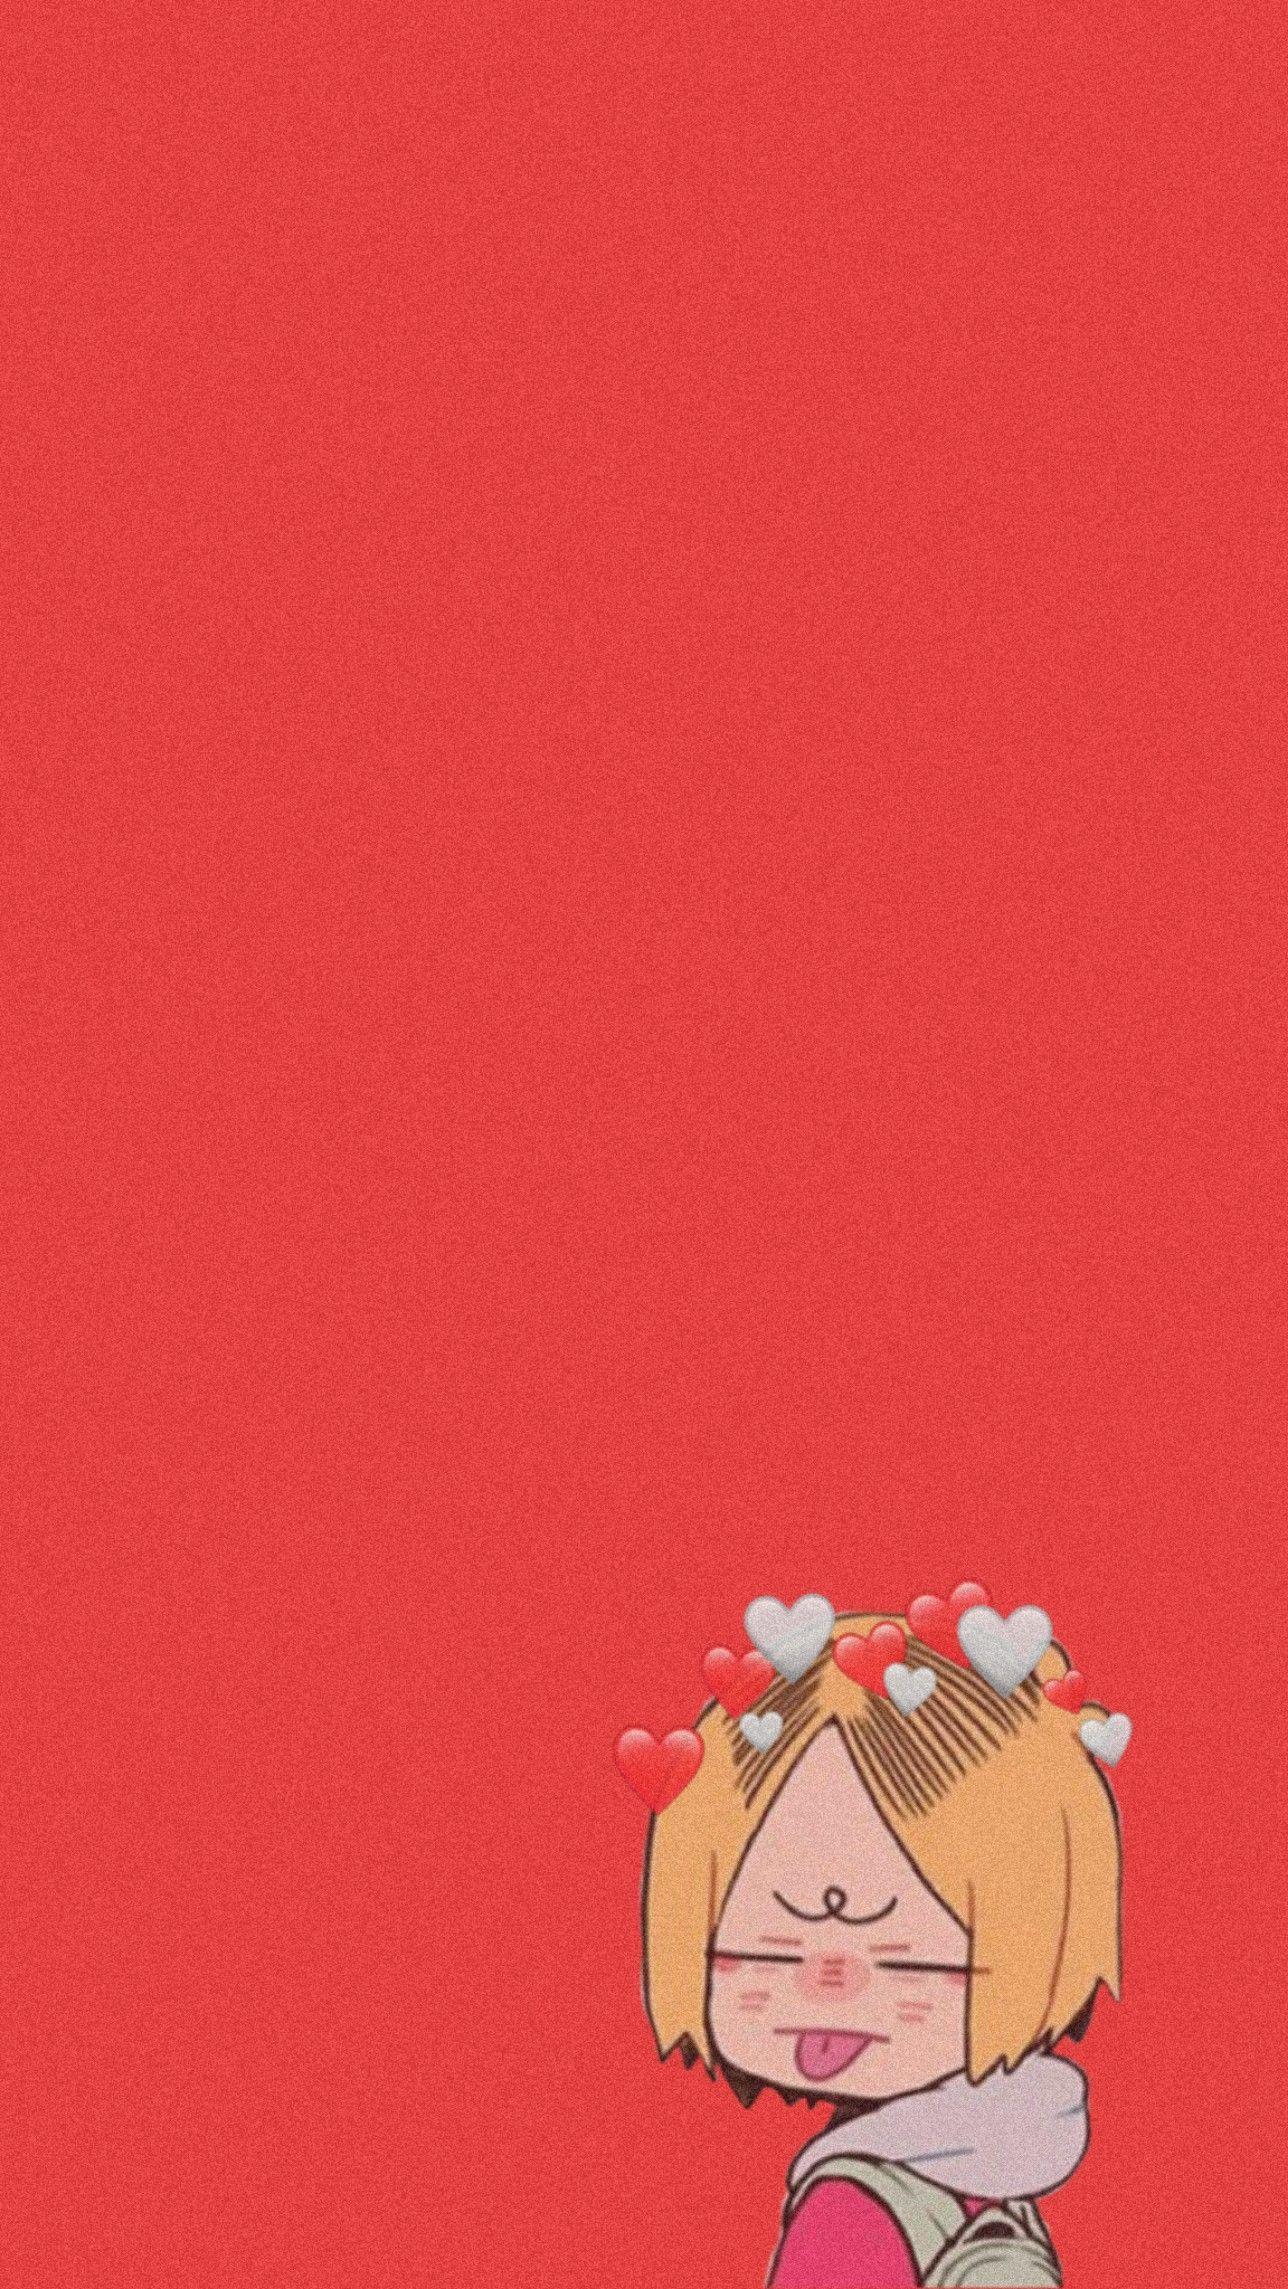 Kenma Kozume Wallpaper Haikyuu Wallpaper Chibi Wallpaper Cute Anime Wallpaper Anime chibi wallpaper red